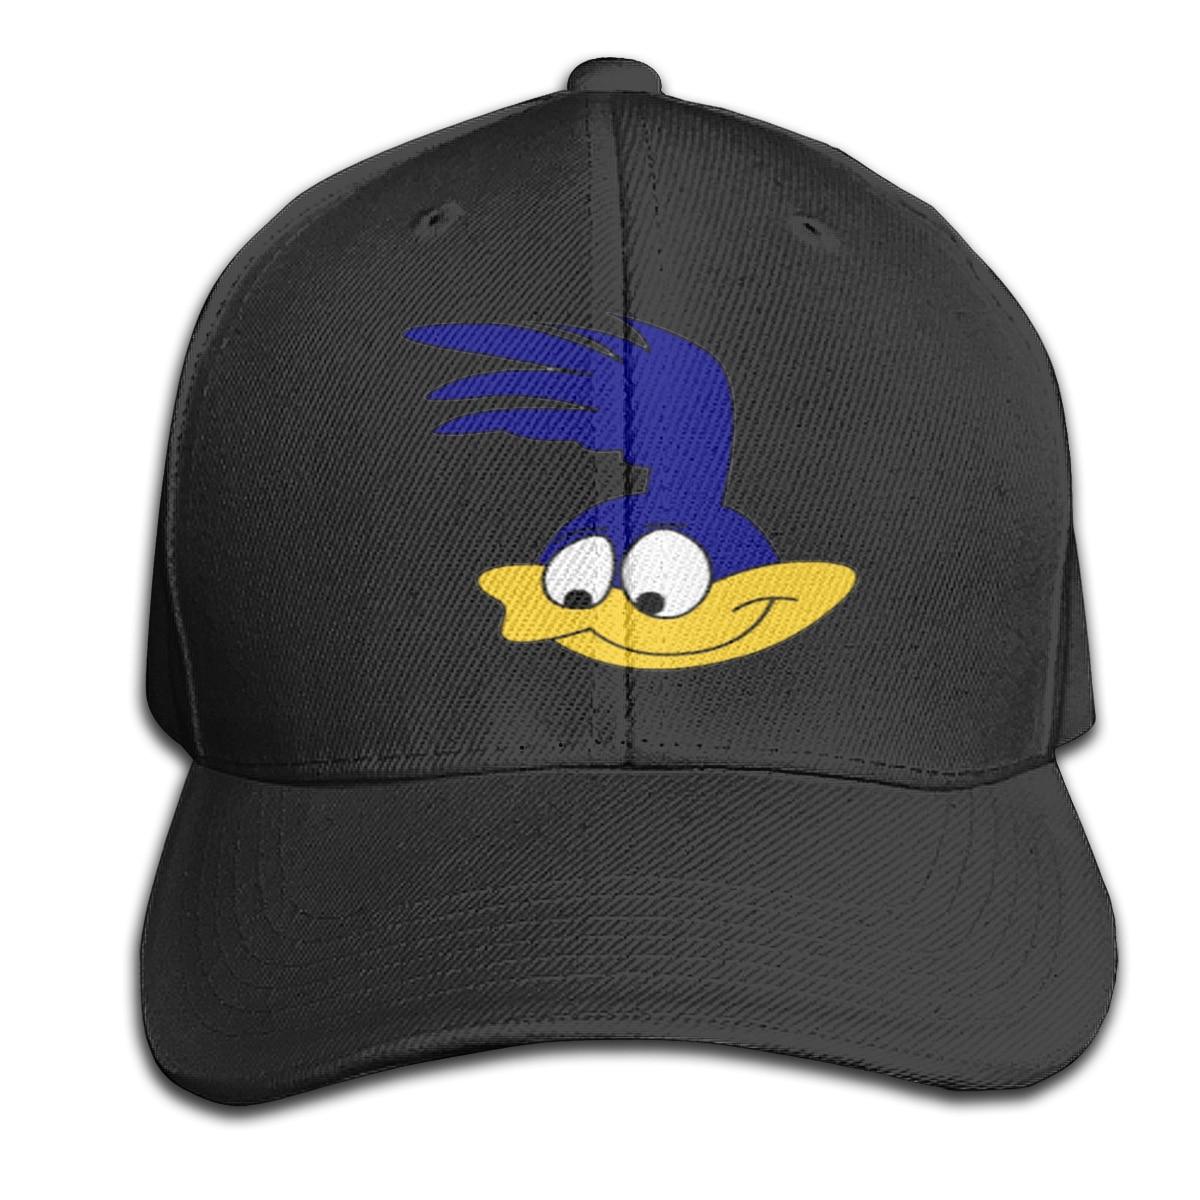 Бейсболка Roadrunner 1106 бейсболка кепка мужская кепка Женская Мужская кепка брендовая мужская кепка s солнцезащитный козырек для мужчин Wo